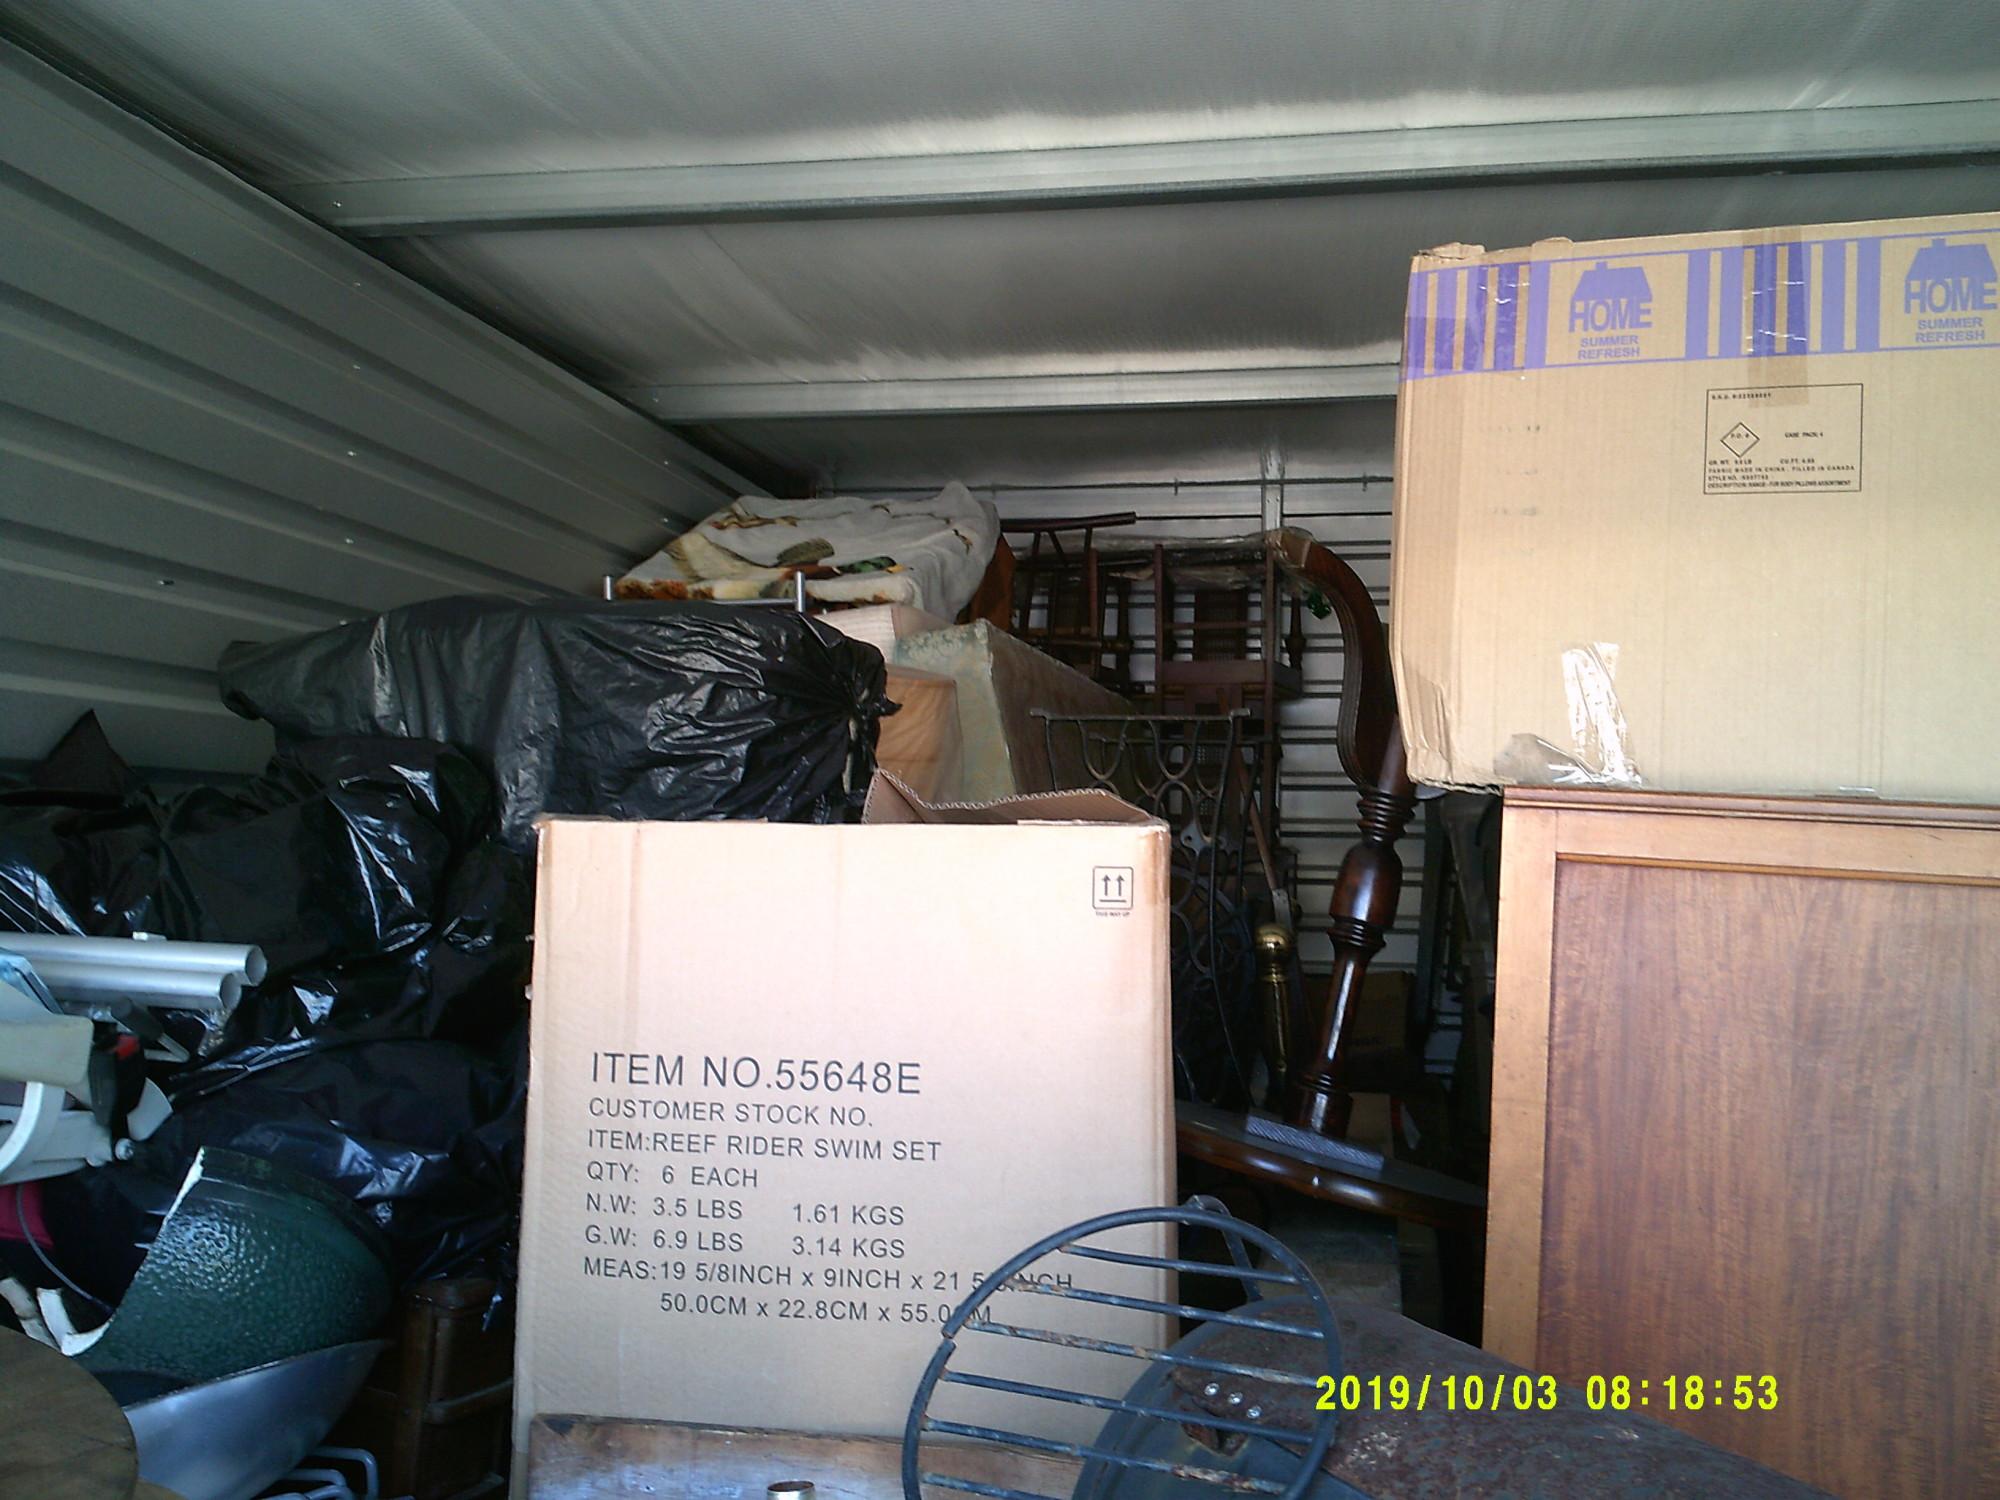 Storage Unit Auction 900343 Panama City Beach Fl